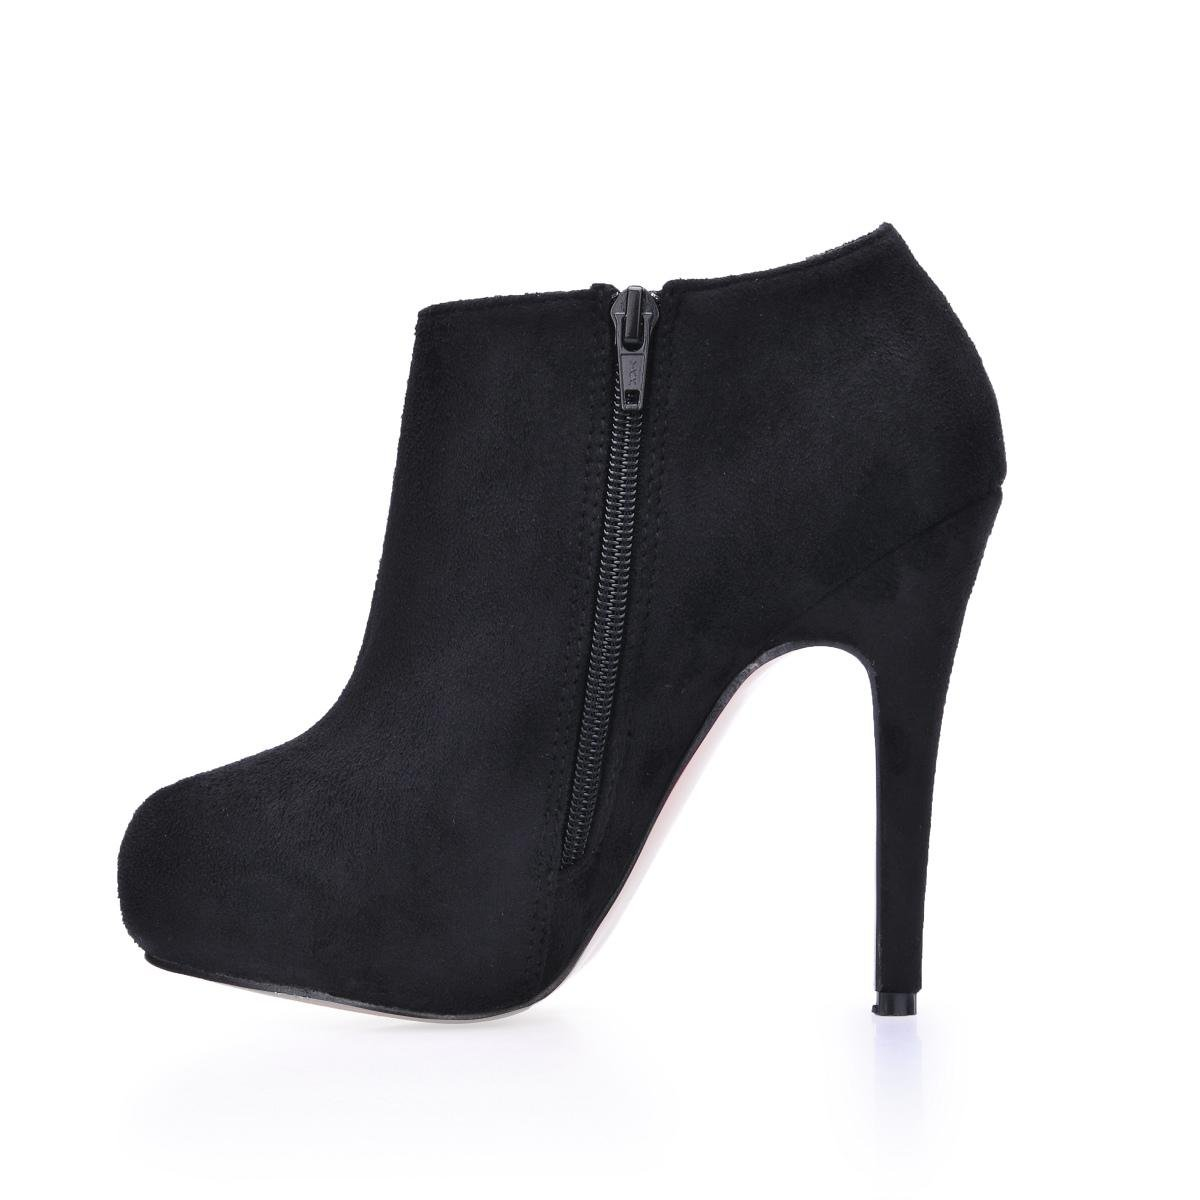 Best 4U® Velvet Damen Stiefeletten Elastic Velvet 4U® 14CM High Heels Stiletto Gummisohle Round Toe Zipper Schuhe Schwarz - 44d803